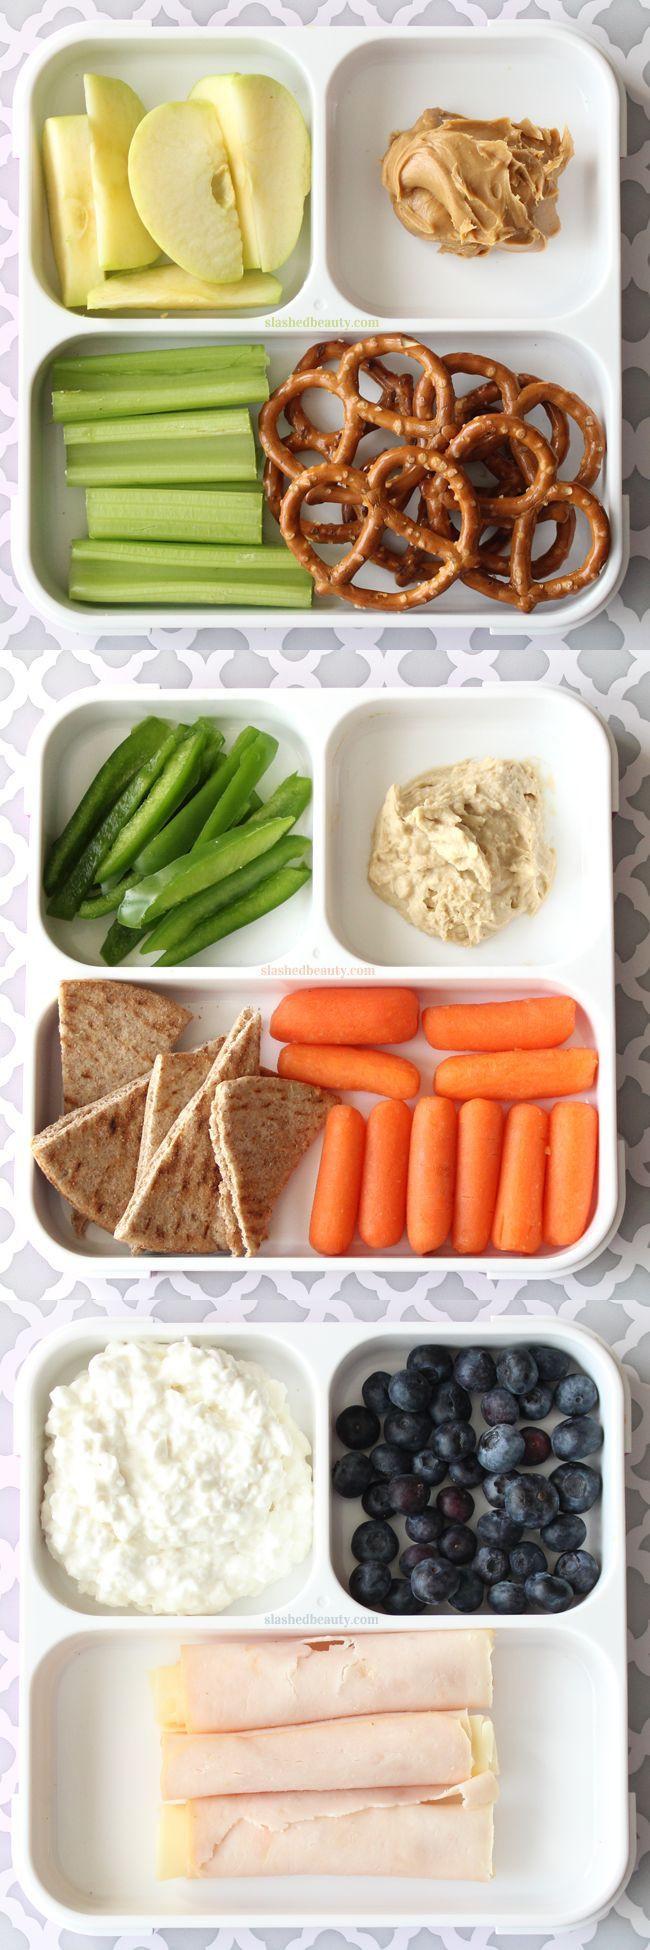 Quick Healthy Snacks  Best 25 Healthy snacks ideas on Pinterest